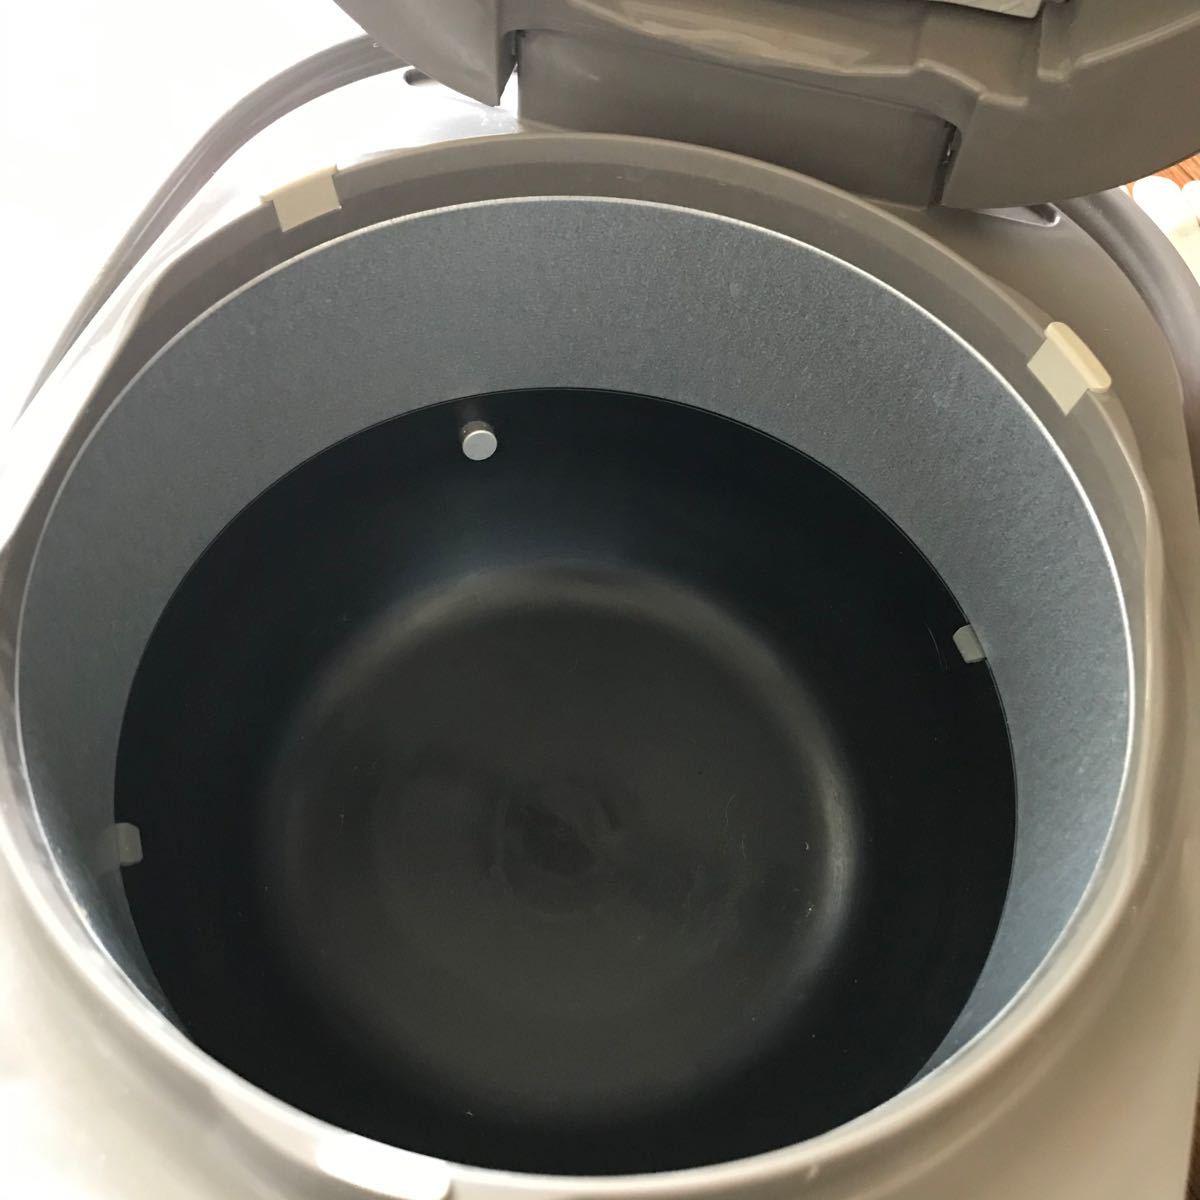 一升炊 10合 ZOJIRUSHI 象印 IH IH炊飯ジャー 象印炊飯器